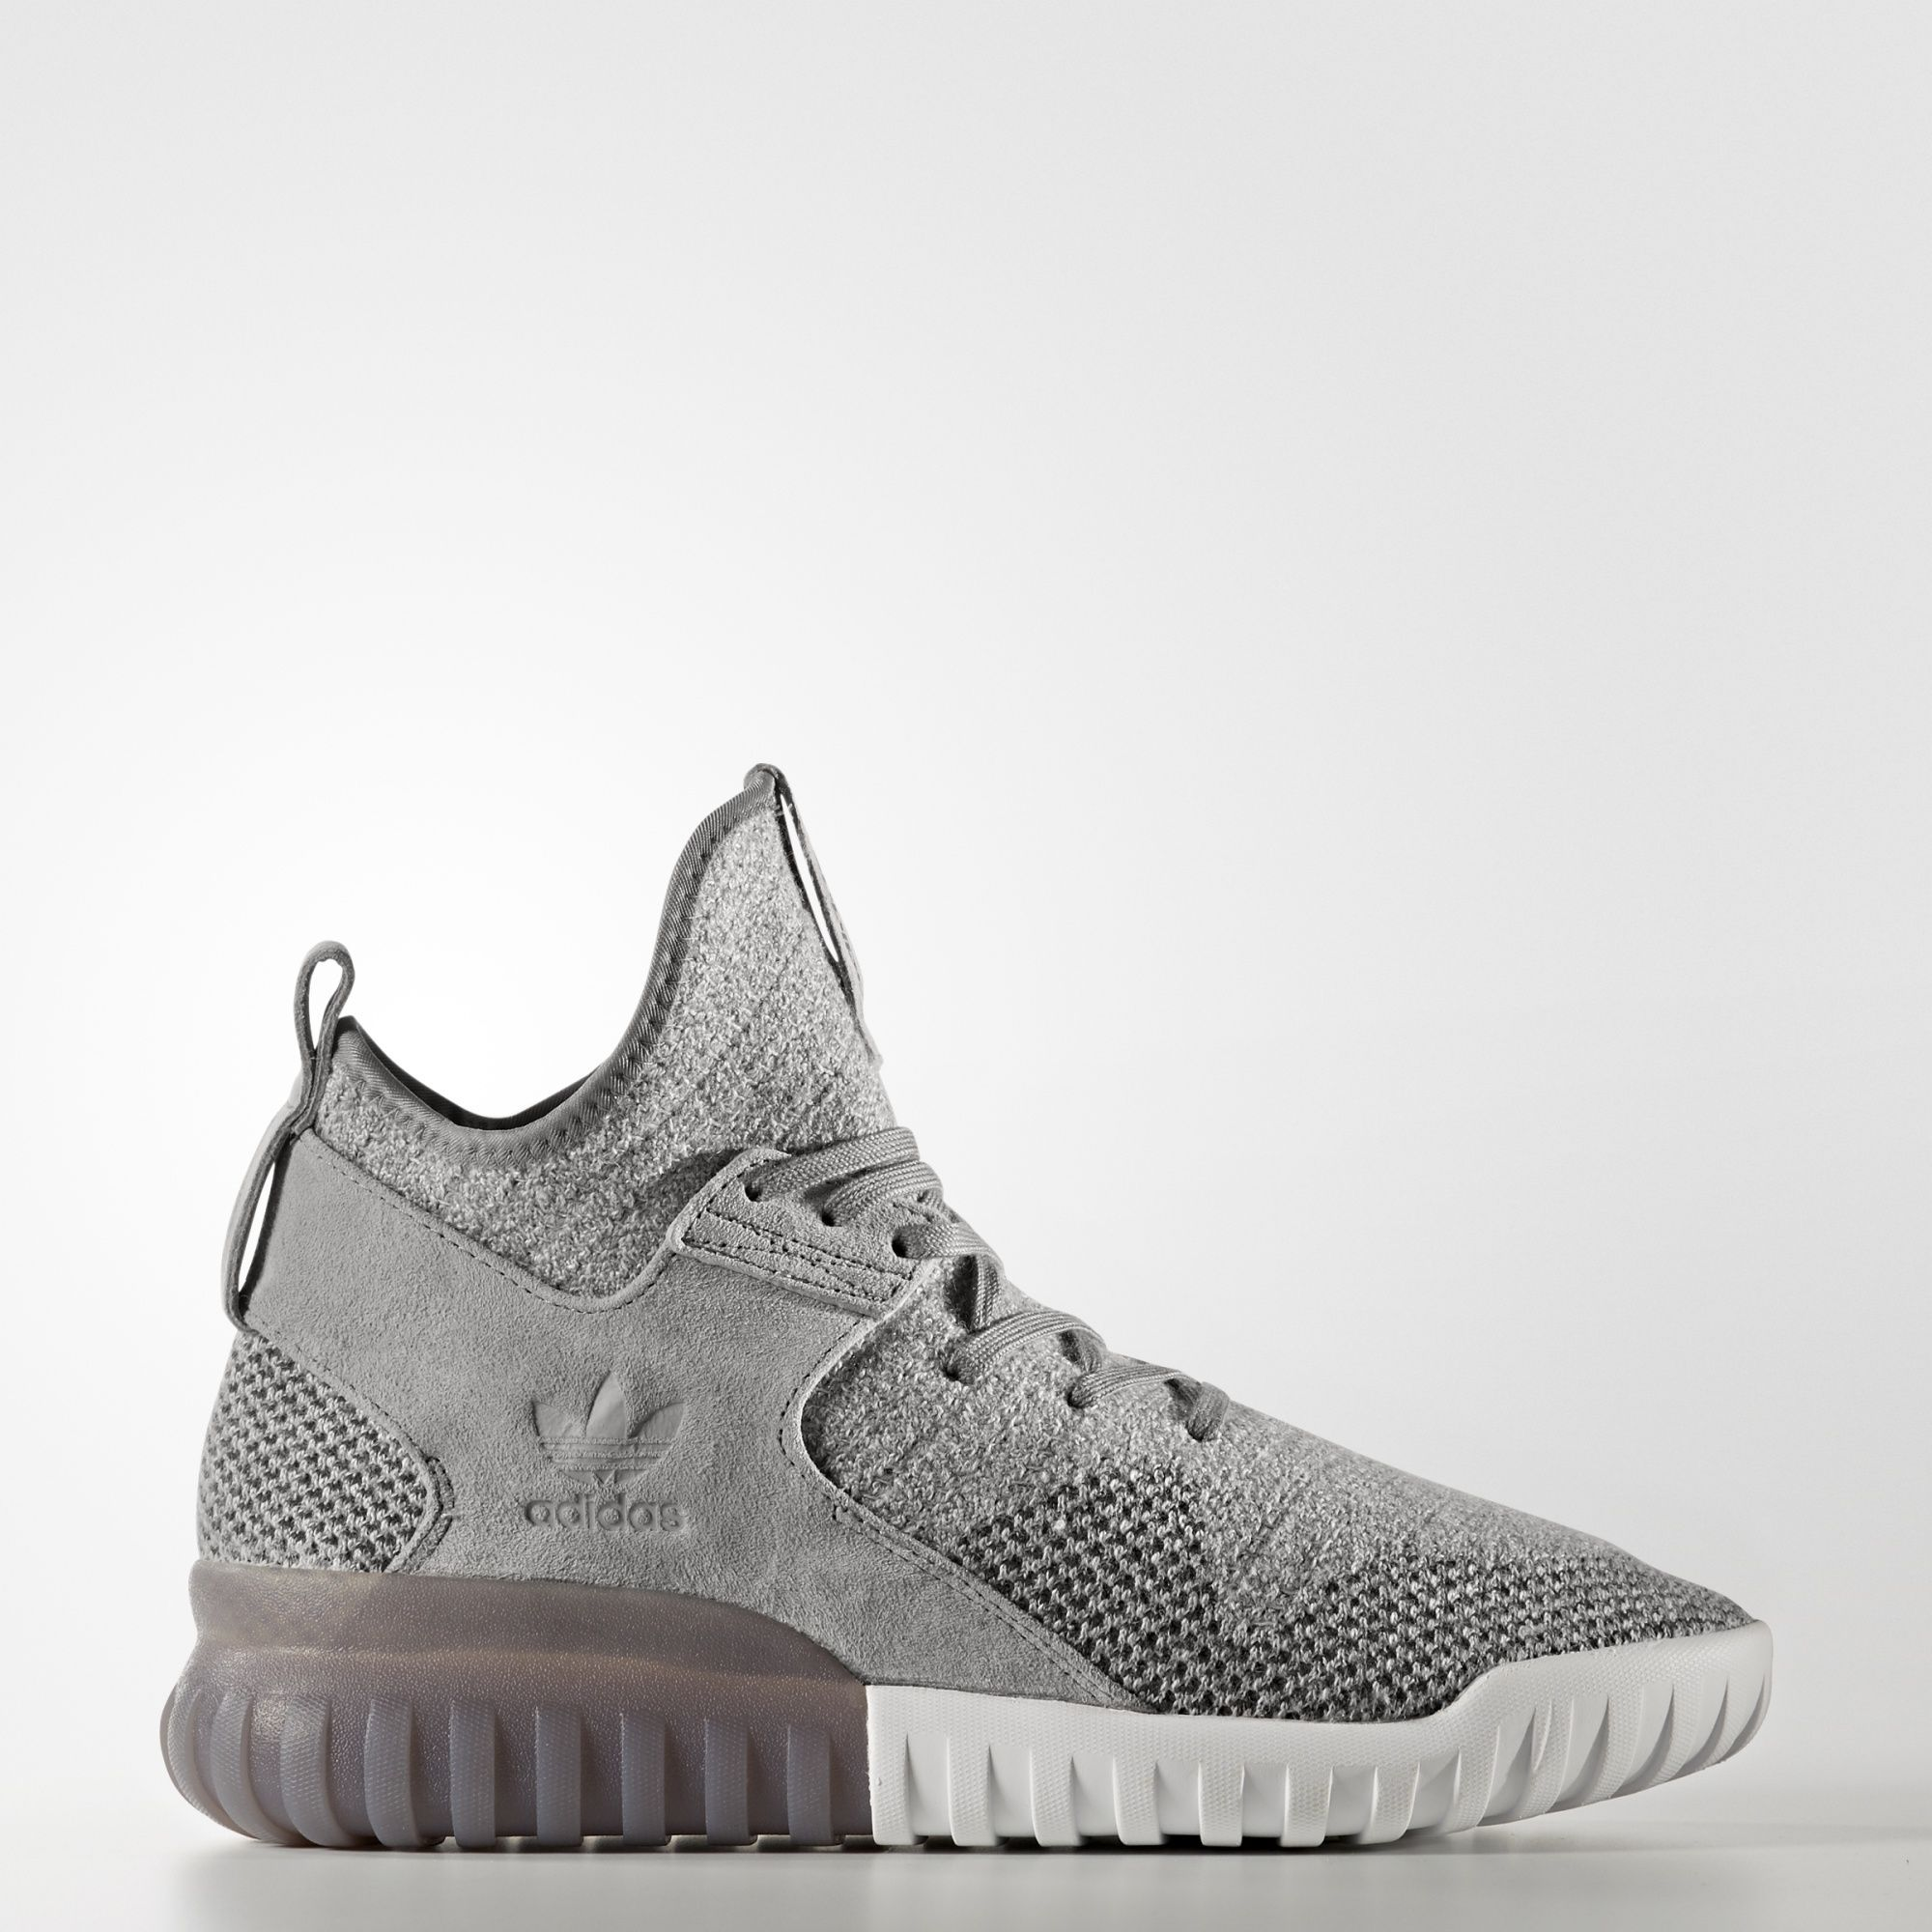 quality design b0206 60144 closeout adidas tubular runner primeknit bianca ed8d6 b0390